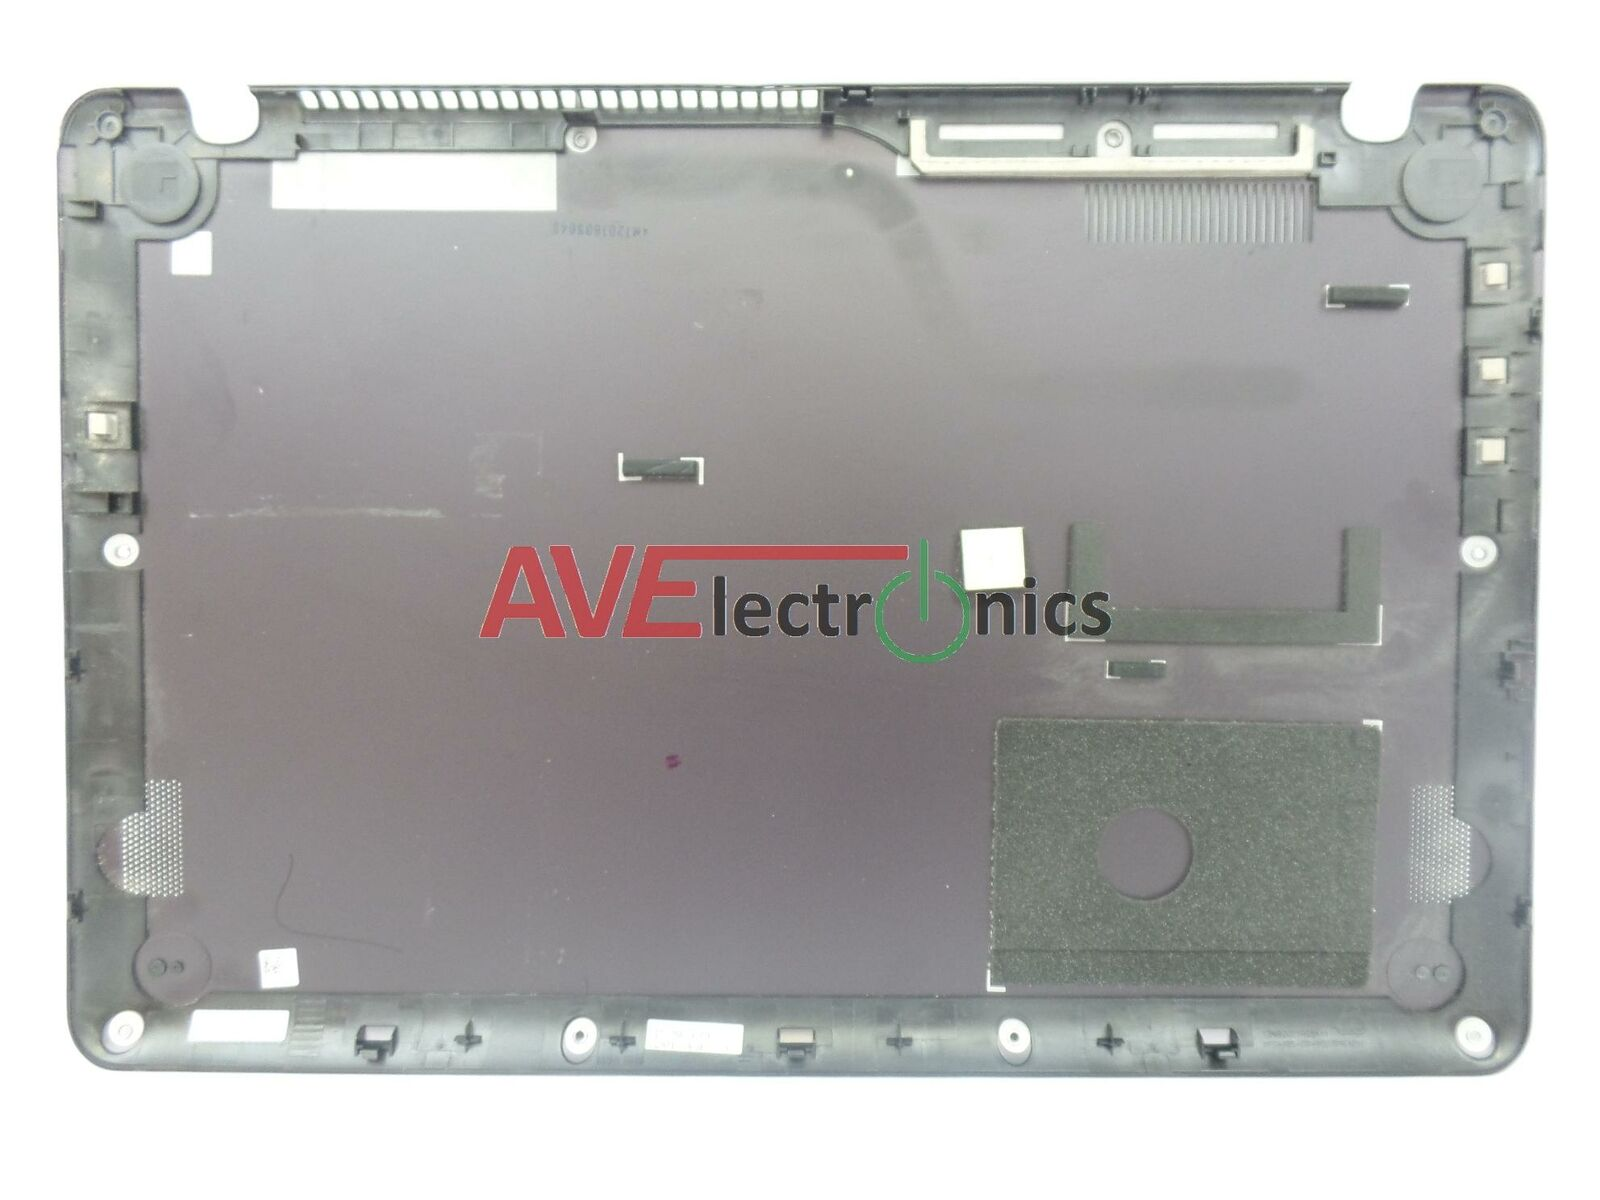 ACS COMPATIBLE with Asus Q534ux-bhI7t16 Hinge Cap Left Replacement